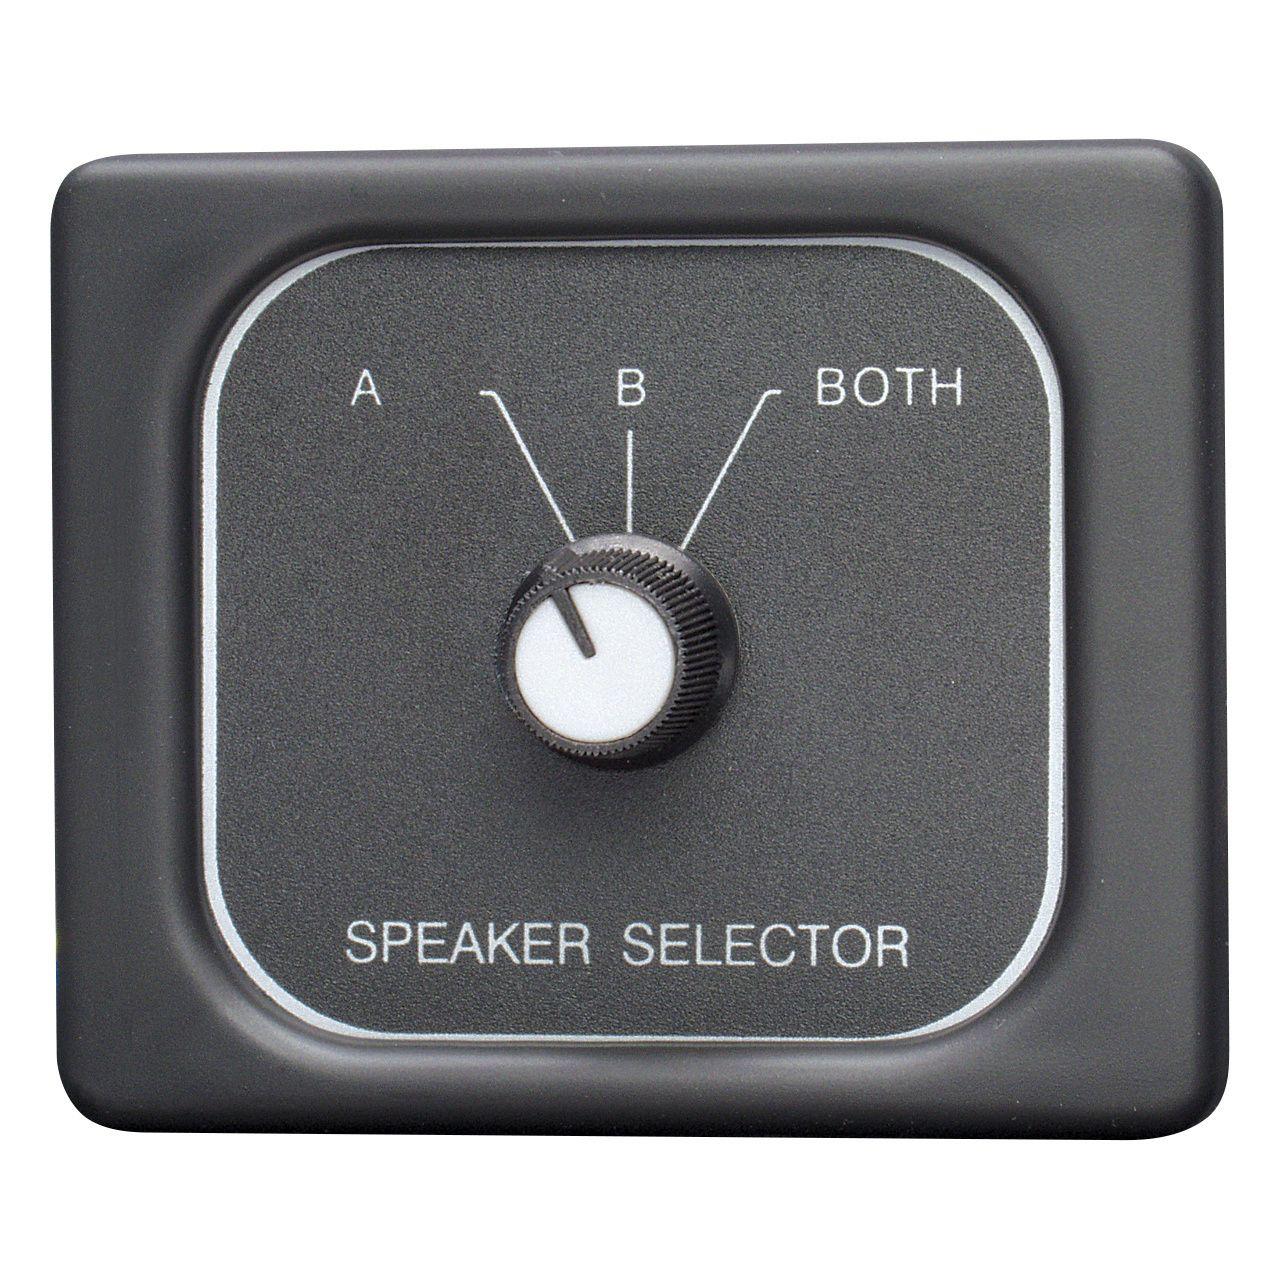 nf_8765] rv speaker selector switch wiring diagram download diagram  nizat hisre rosz hendil mohammedshrine librar wiring 101